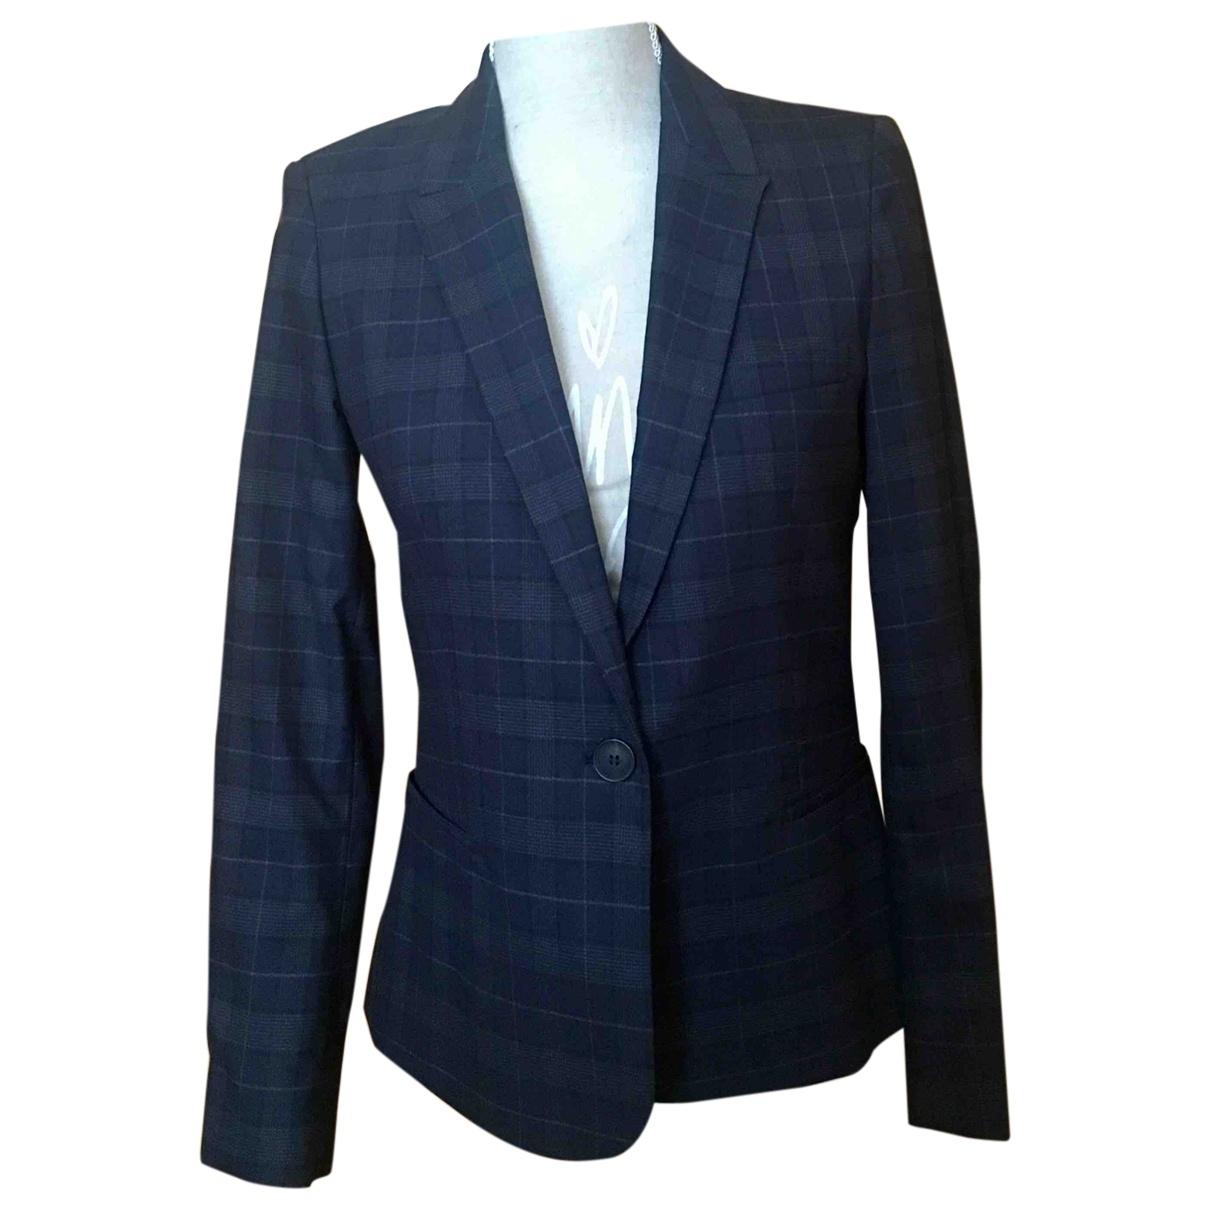 Zara \N Jacke in  Marine Polyester